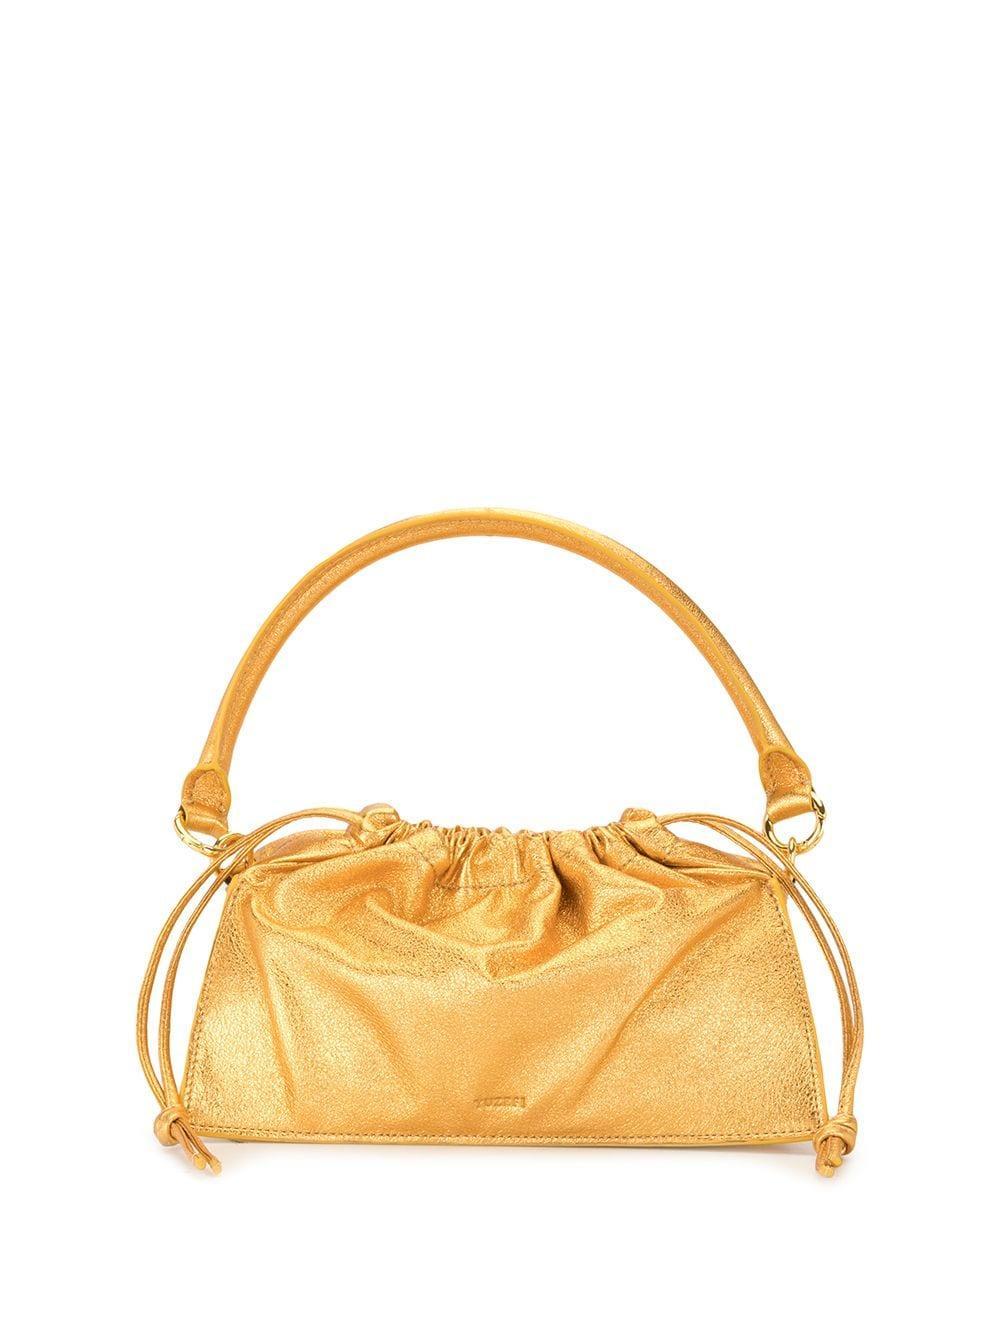 Bom Tote Bag Item # YUZPF20-BO-05